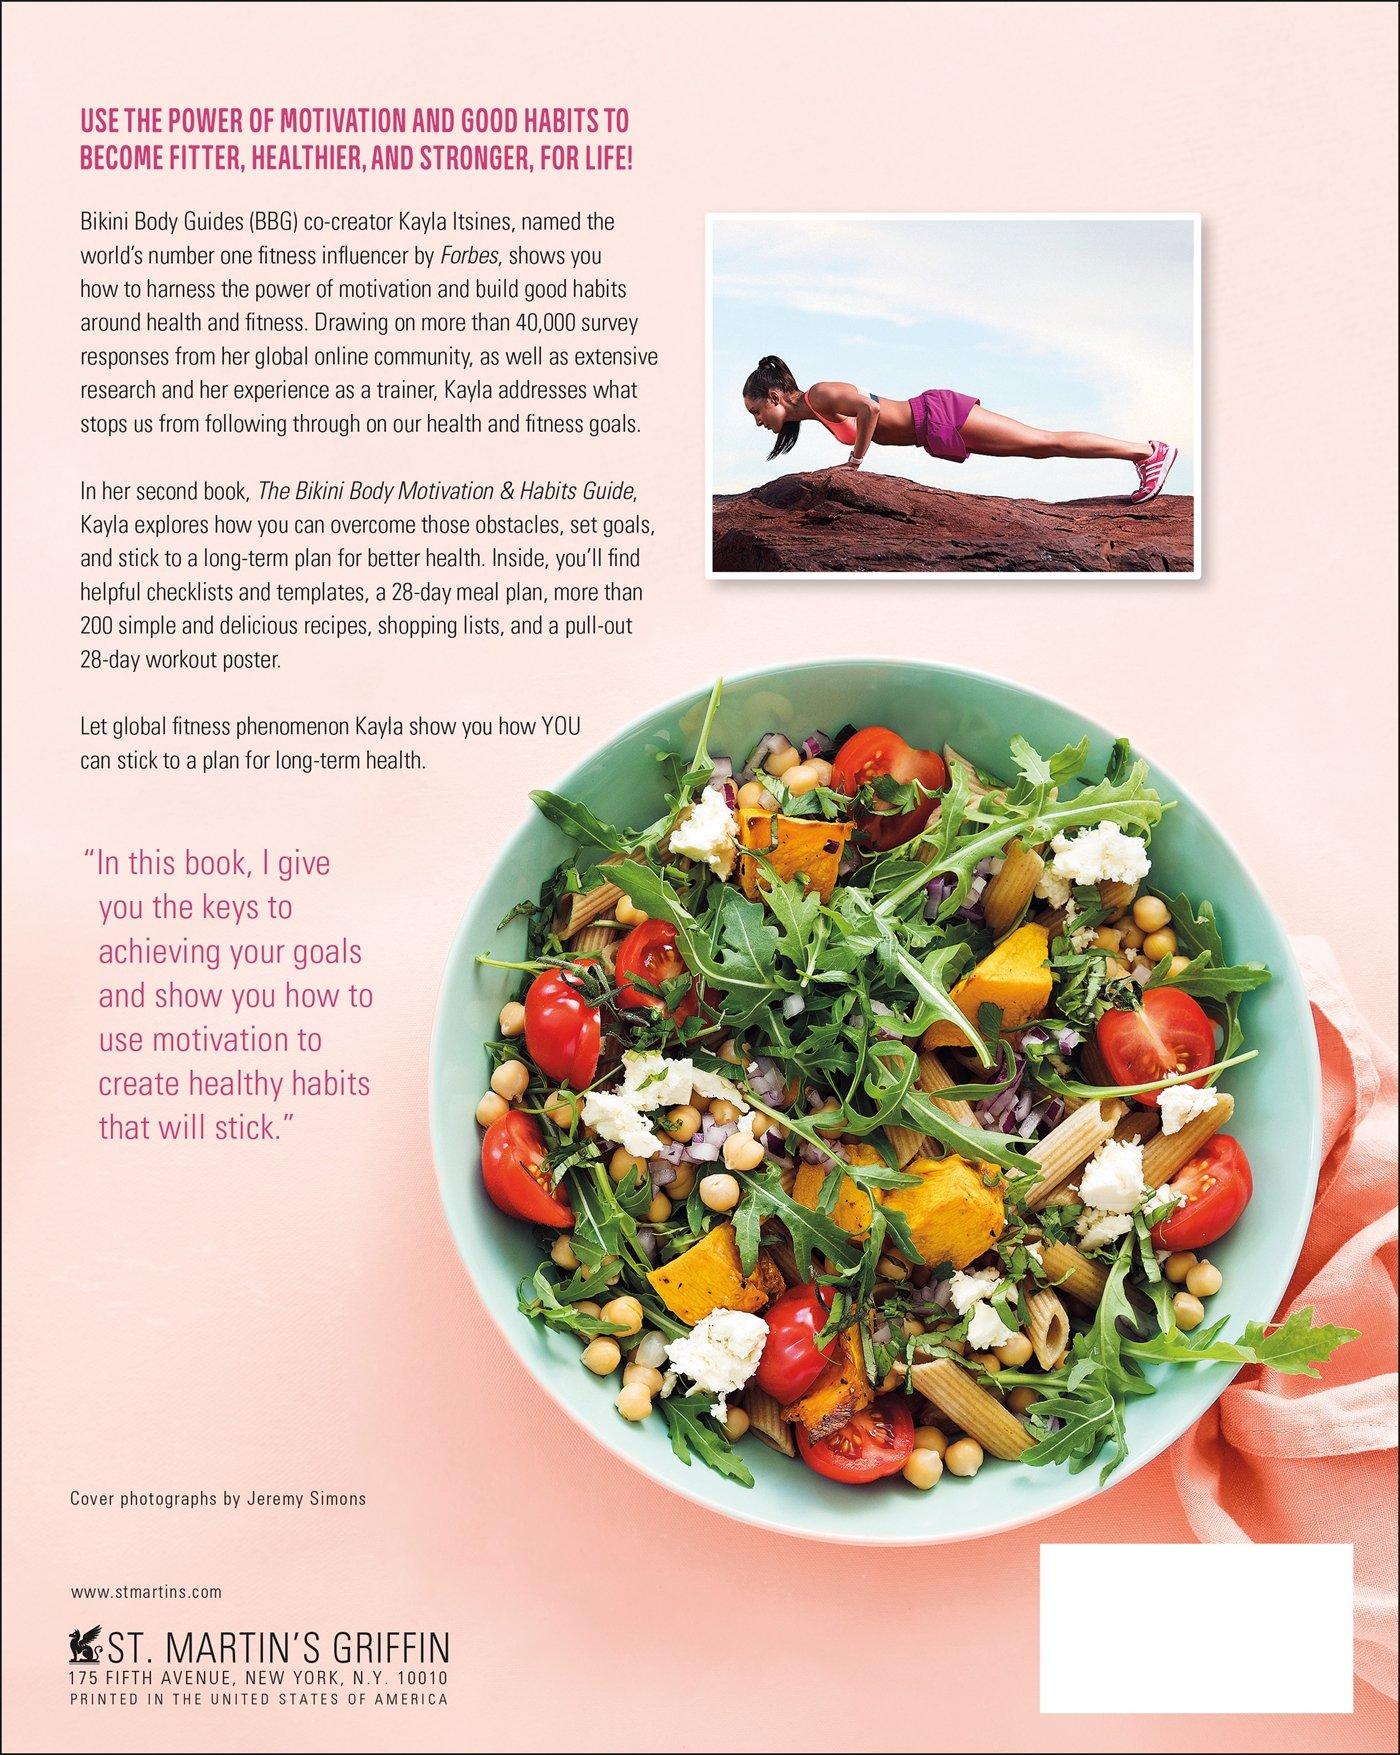 The bikini body motivation habits guide kayla itsines the bikini body motivation habits guide kayla itsines 9781250137616 amazon books fandeluxe Image collections